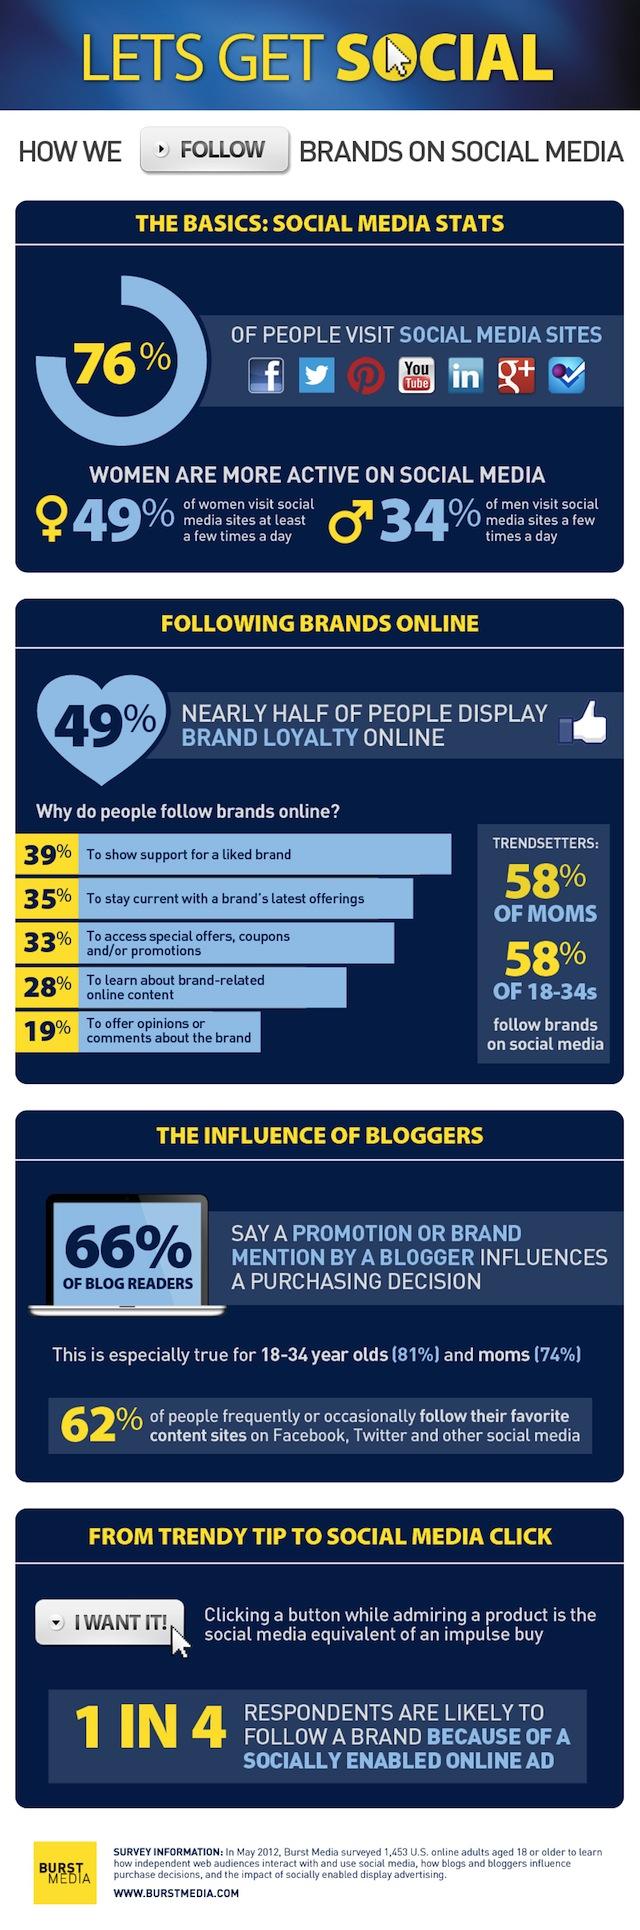 social media brands use